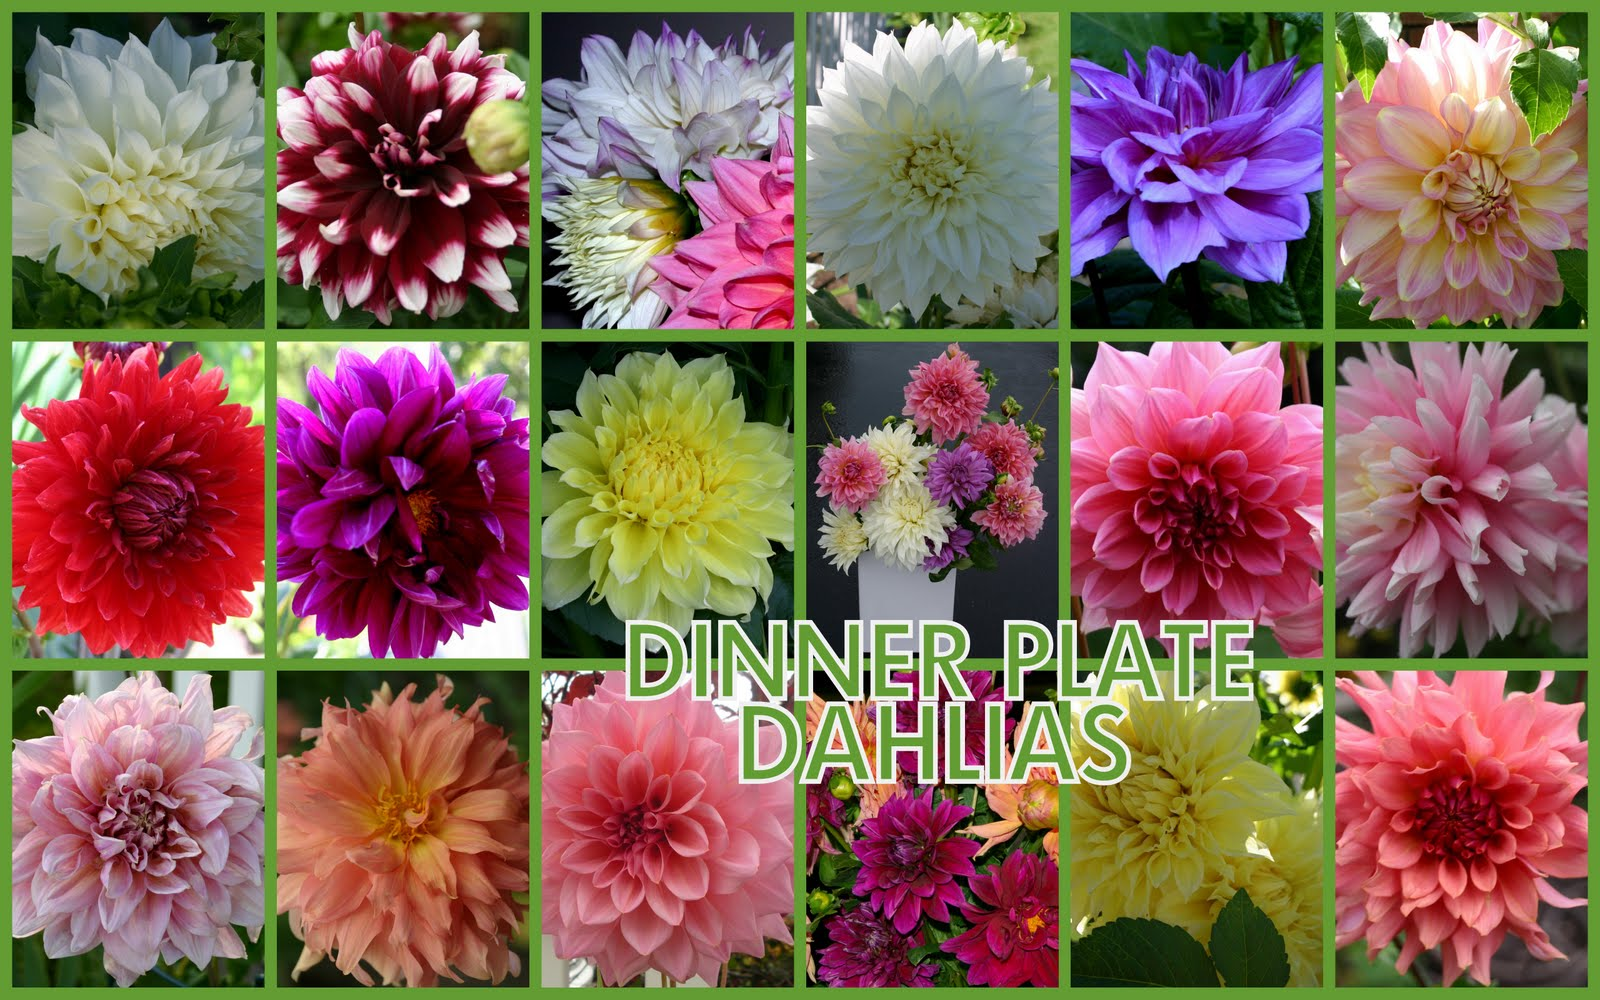 DINNER PLATE DAHLIAS